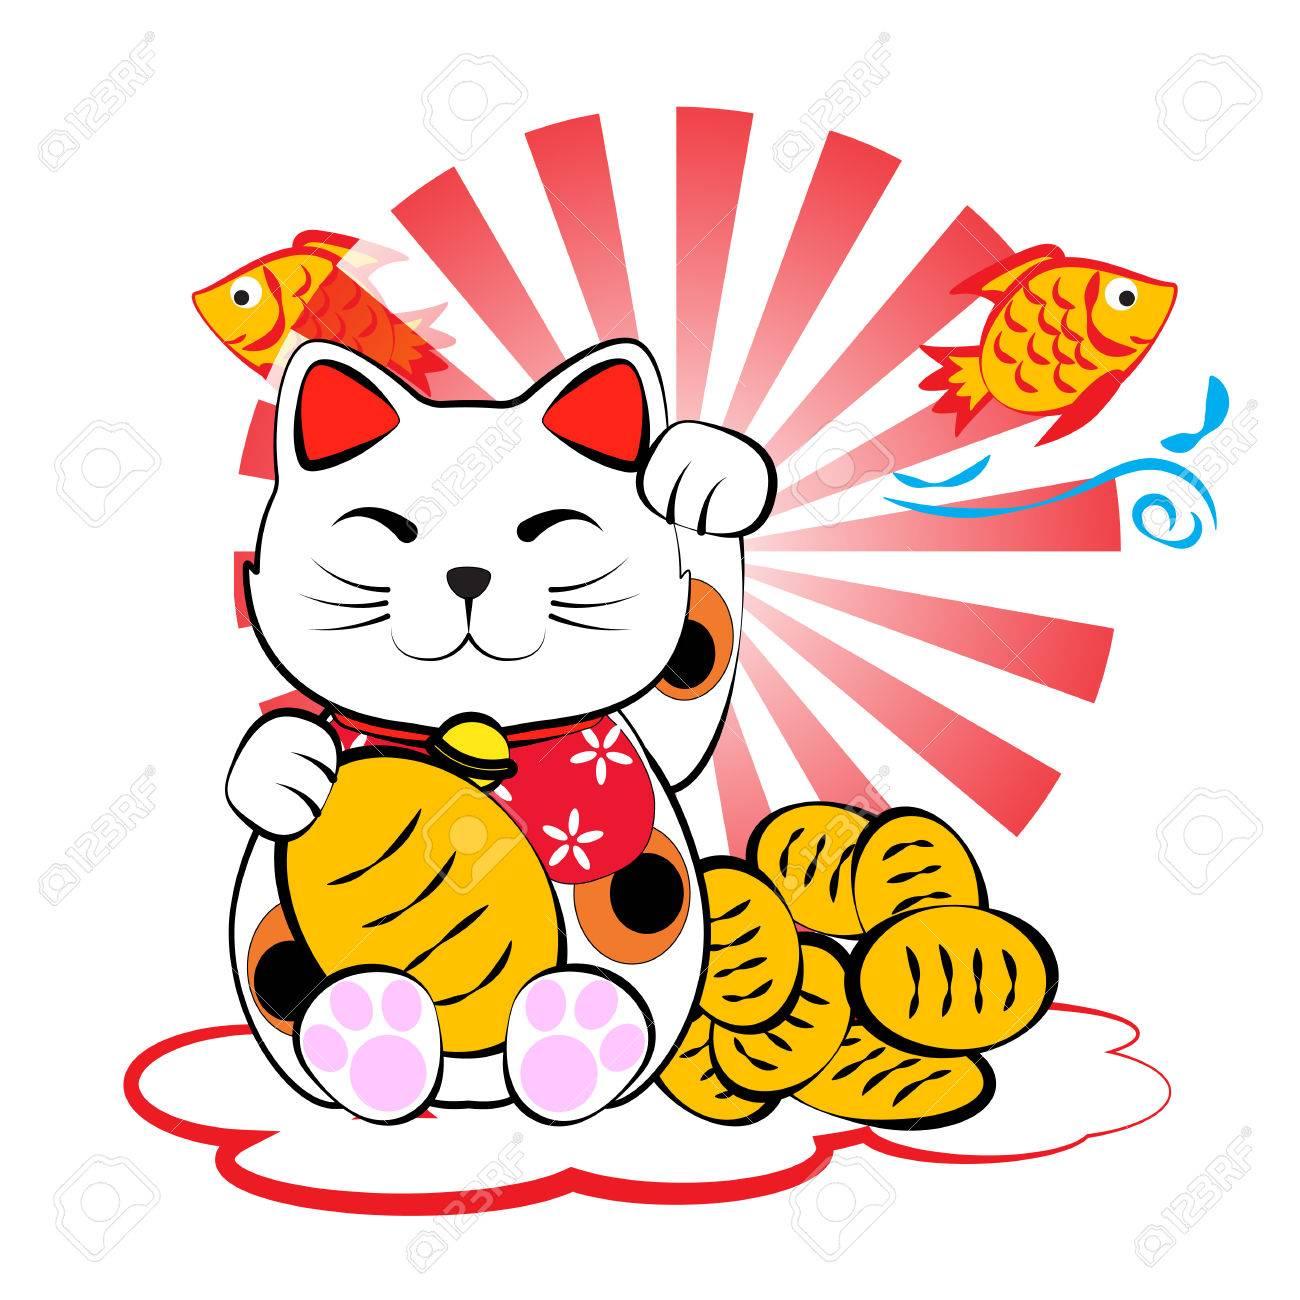 Japanese lucky cat meneki neko with gold and fish for lucky money and plentifully - 39554443